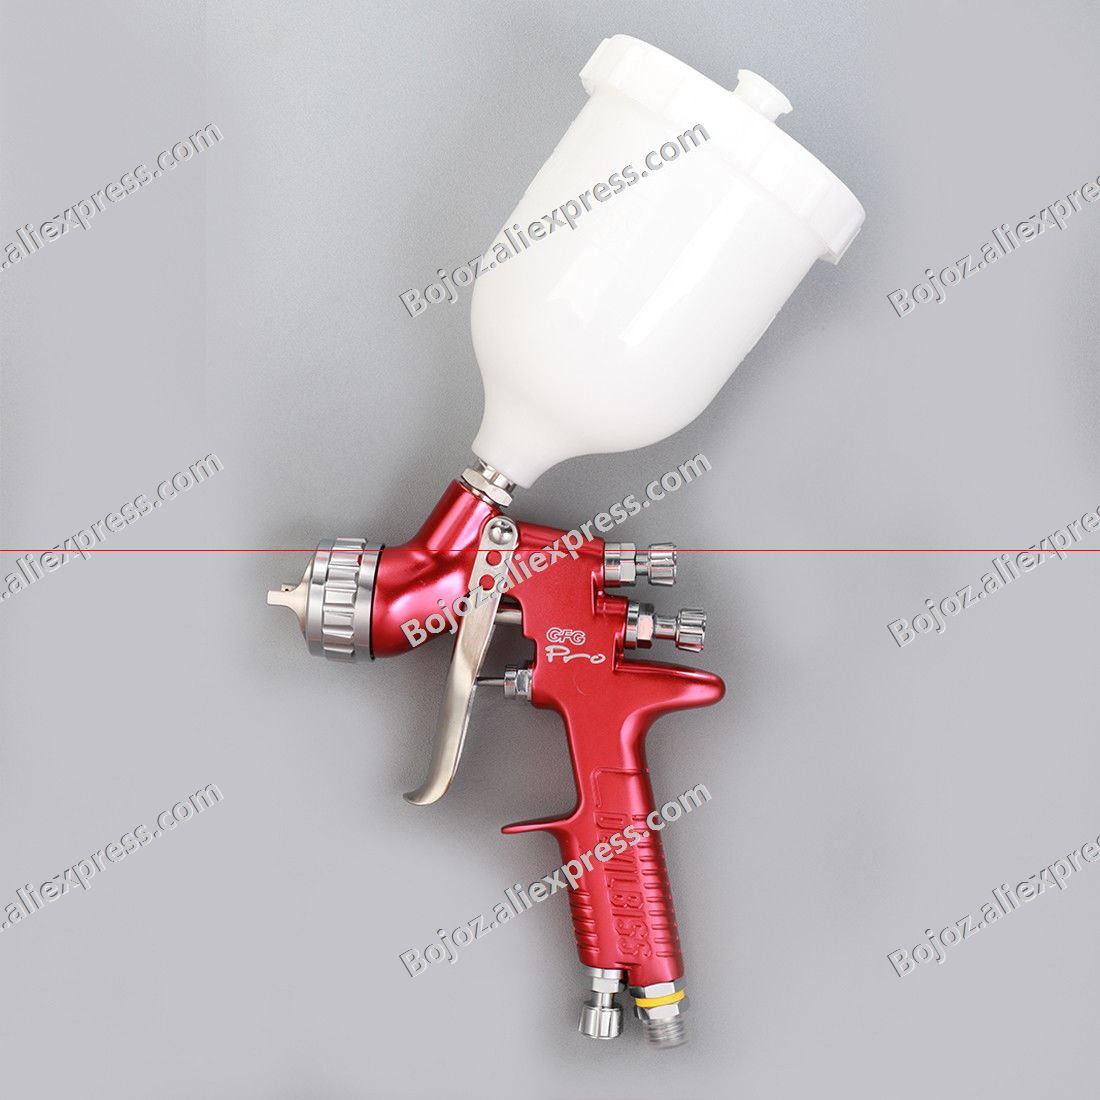 Professional GFG Air paint spray gun for car body HVLP 1.3mm painted high efficiency/ spray gun GTI sprayer paint tools